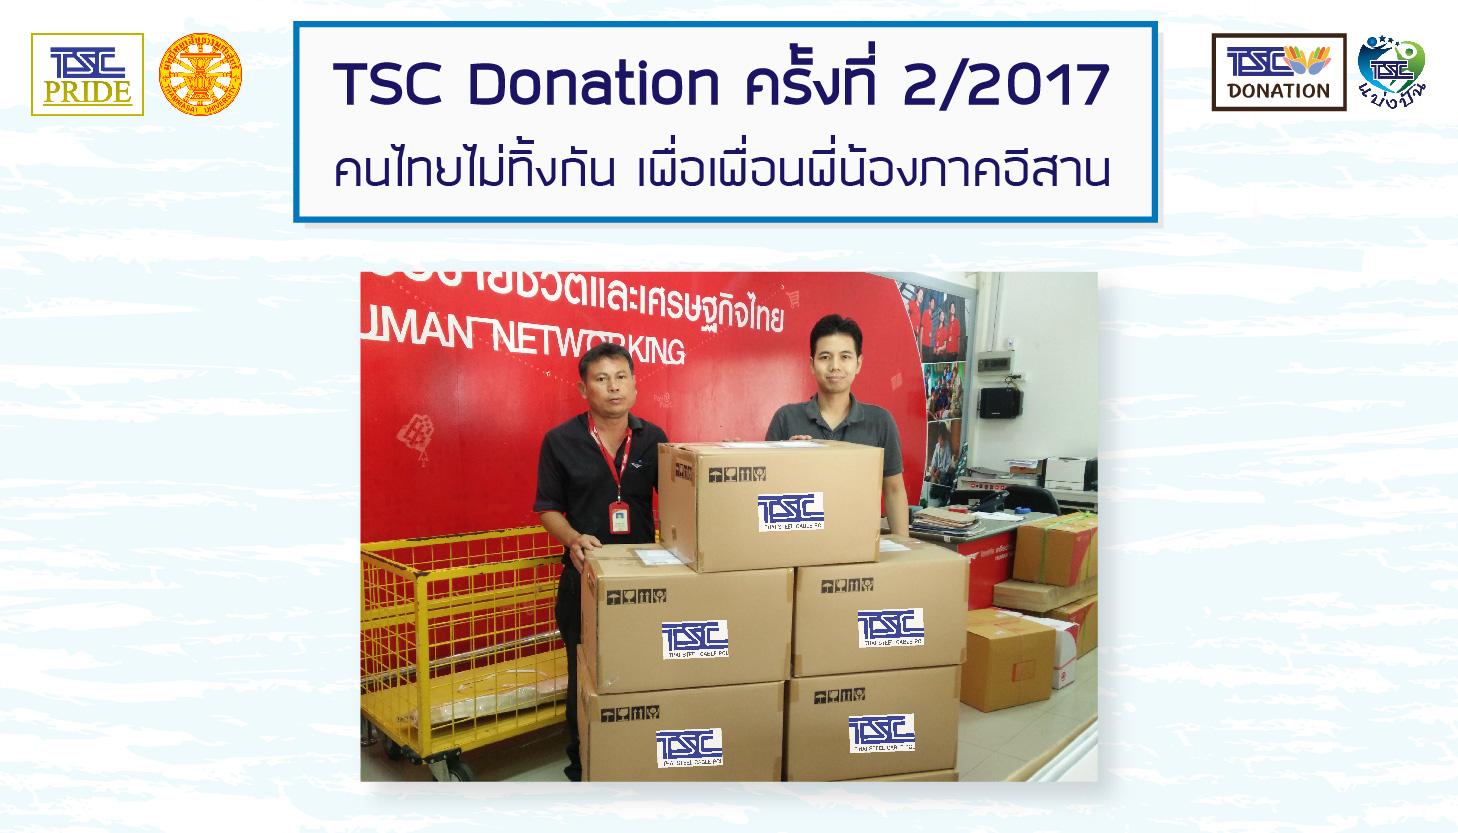 TSC Donation 02/2017